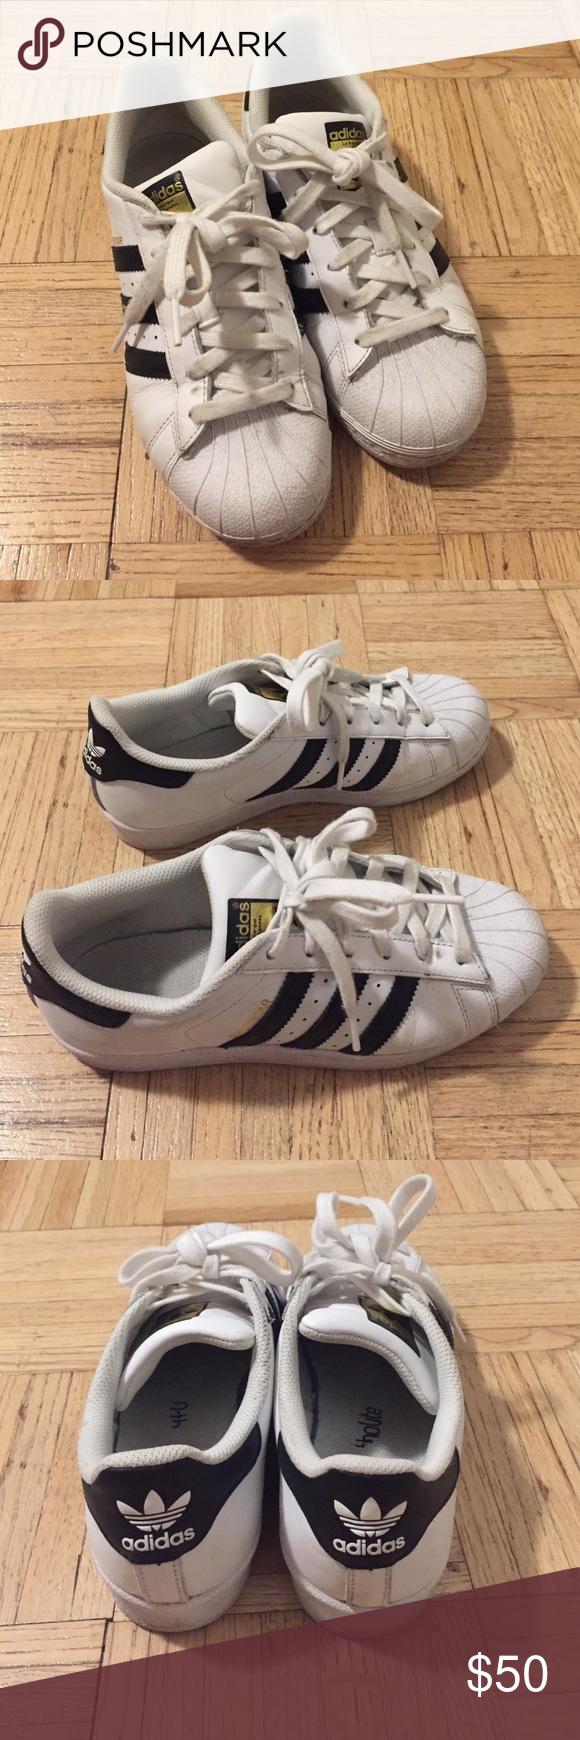 Adidas la Superstar Kid | Size 5, o Adidas tamaño de la mujer 7 | 39db1bb - sfitness.xyz